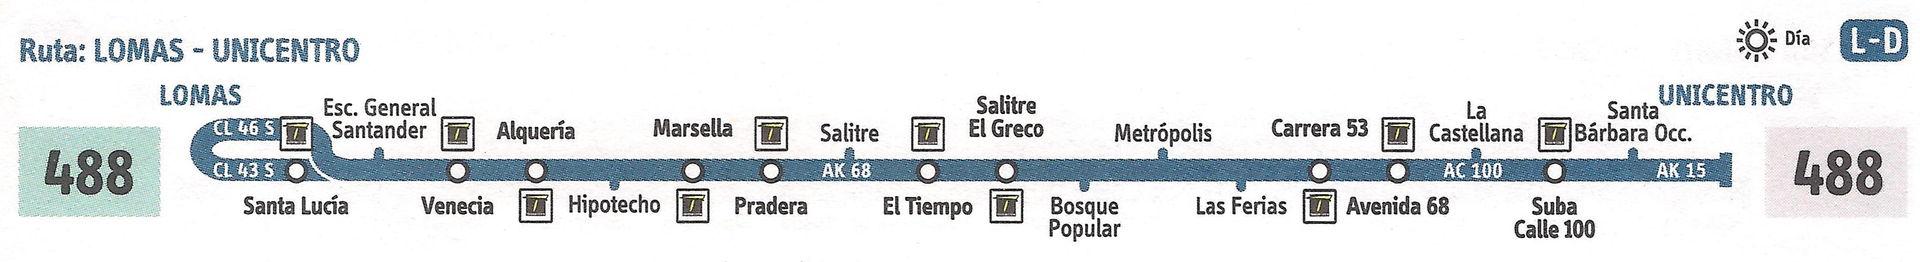 Ruta SITP: Ruta 488 Lomas ↔ Unicentro [Urbana] 3